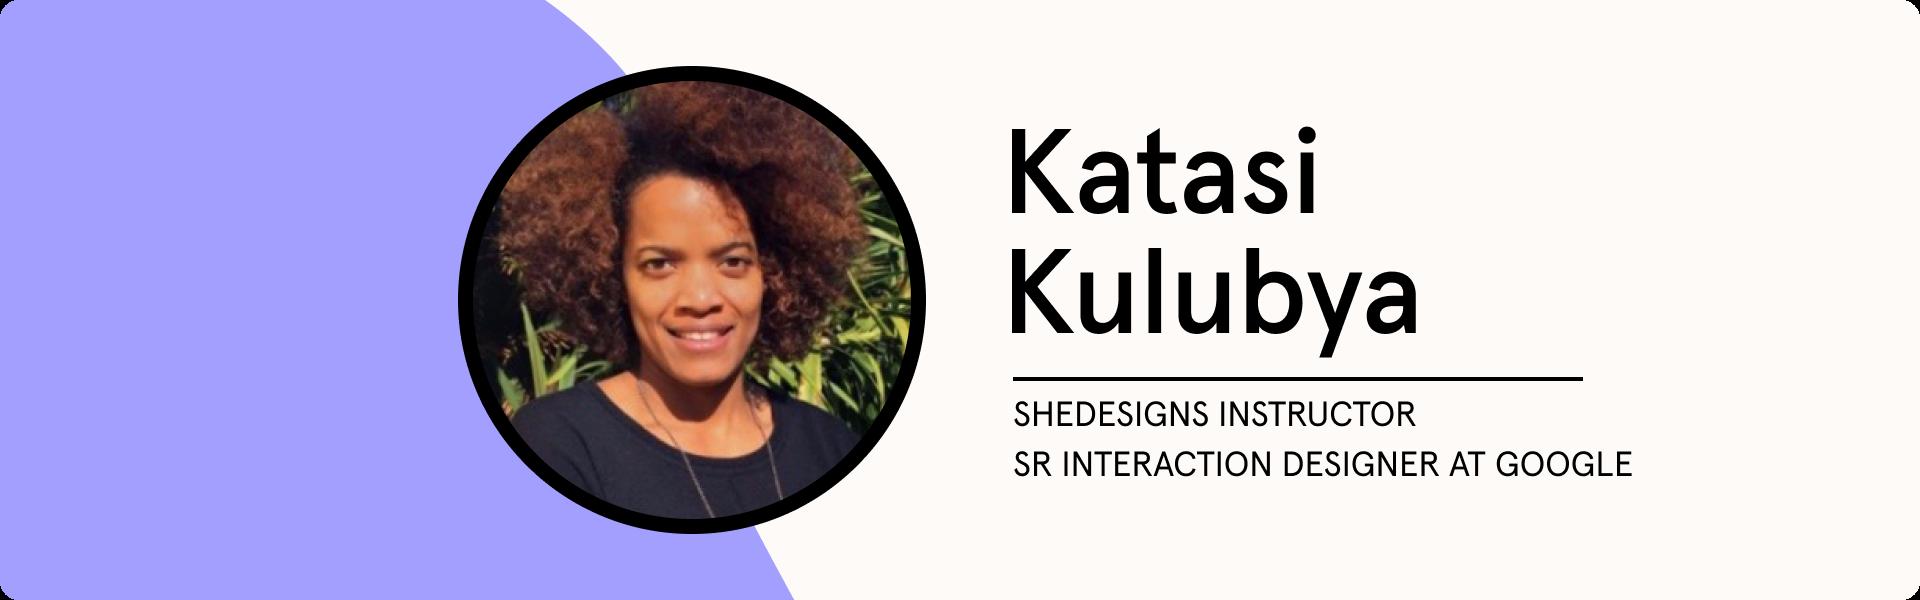 Katasi Kulubya, Shedesigns intructor and Sr. Interaction Designer at Google